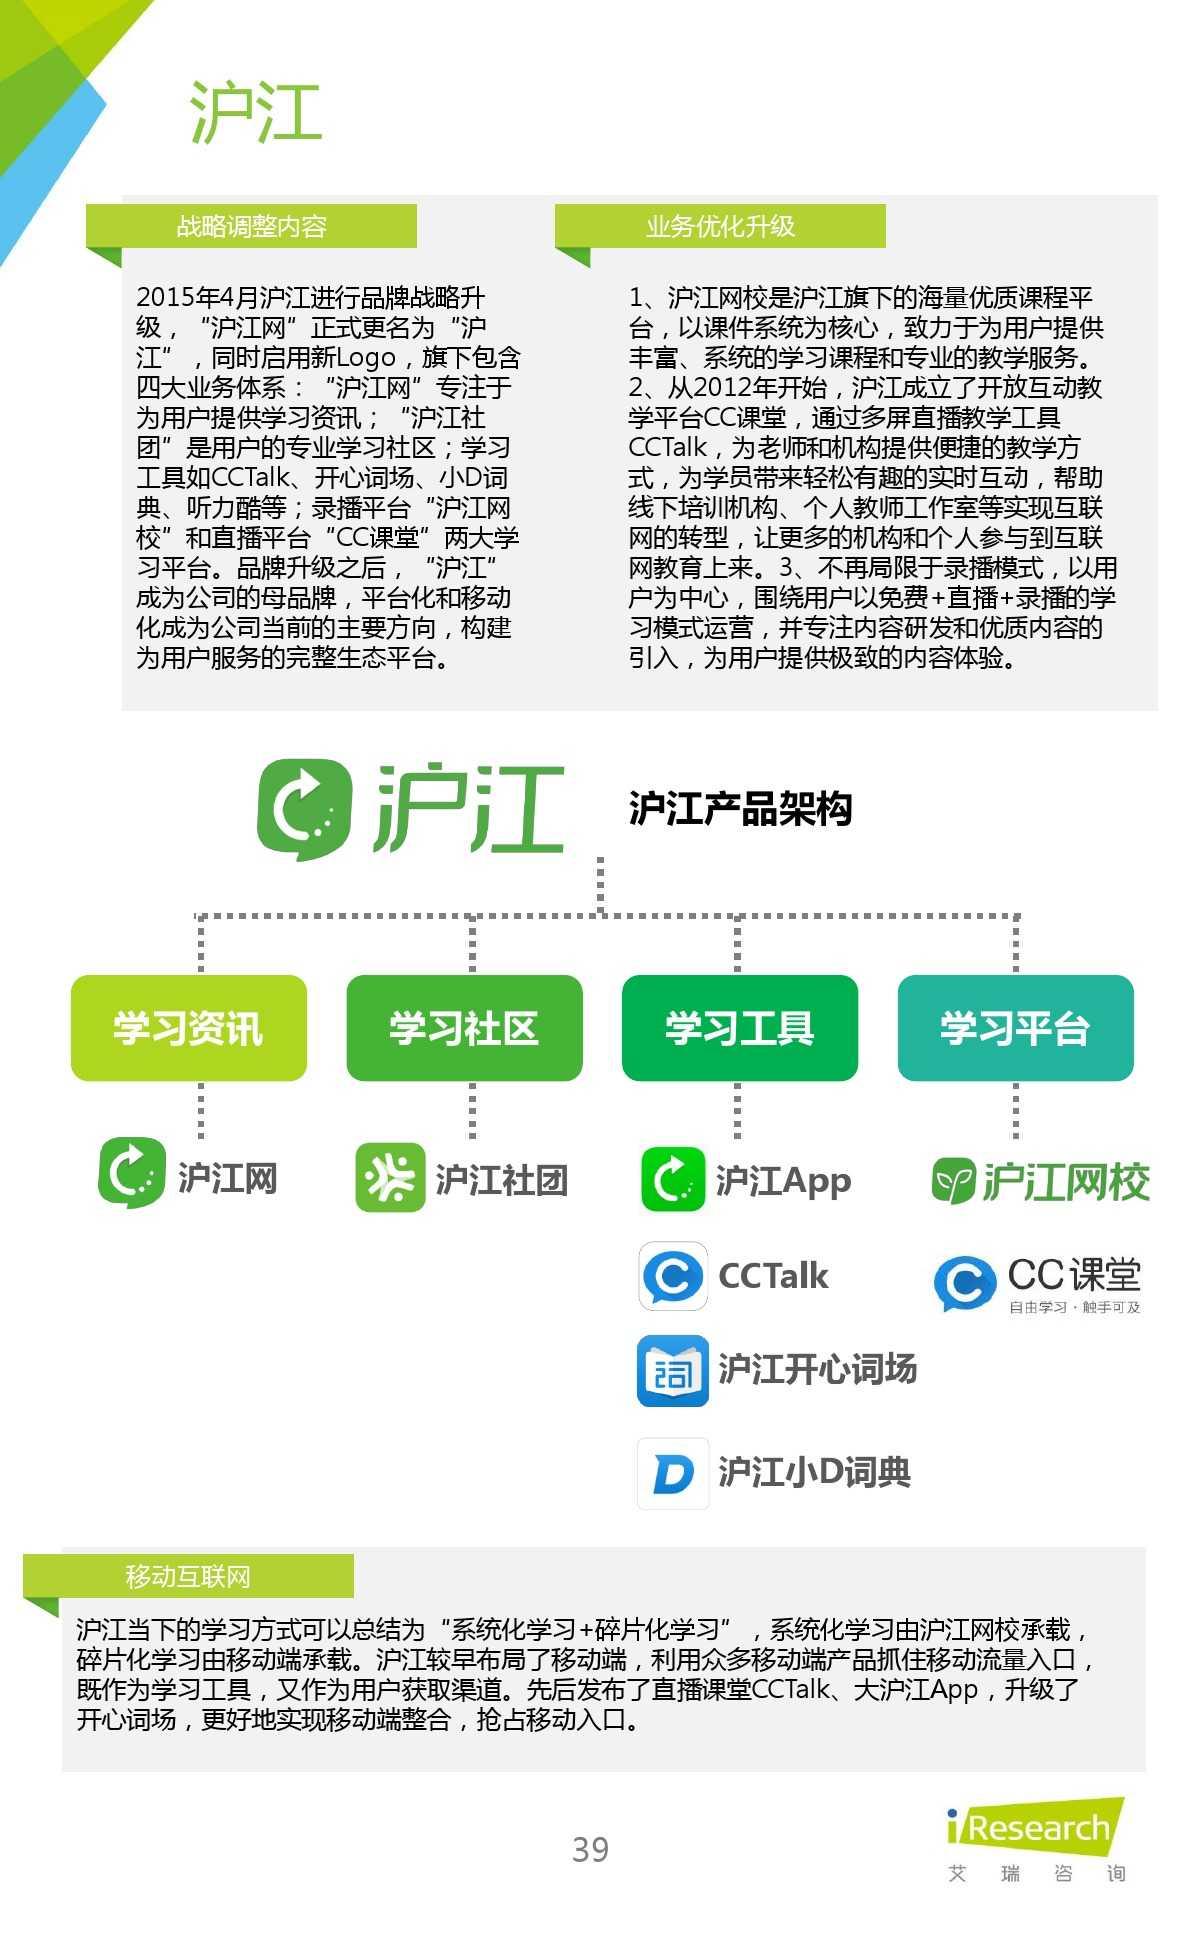 iResearch-2015年中国在线教育平台研究报告_000039